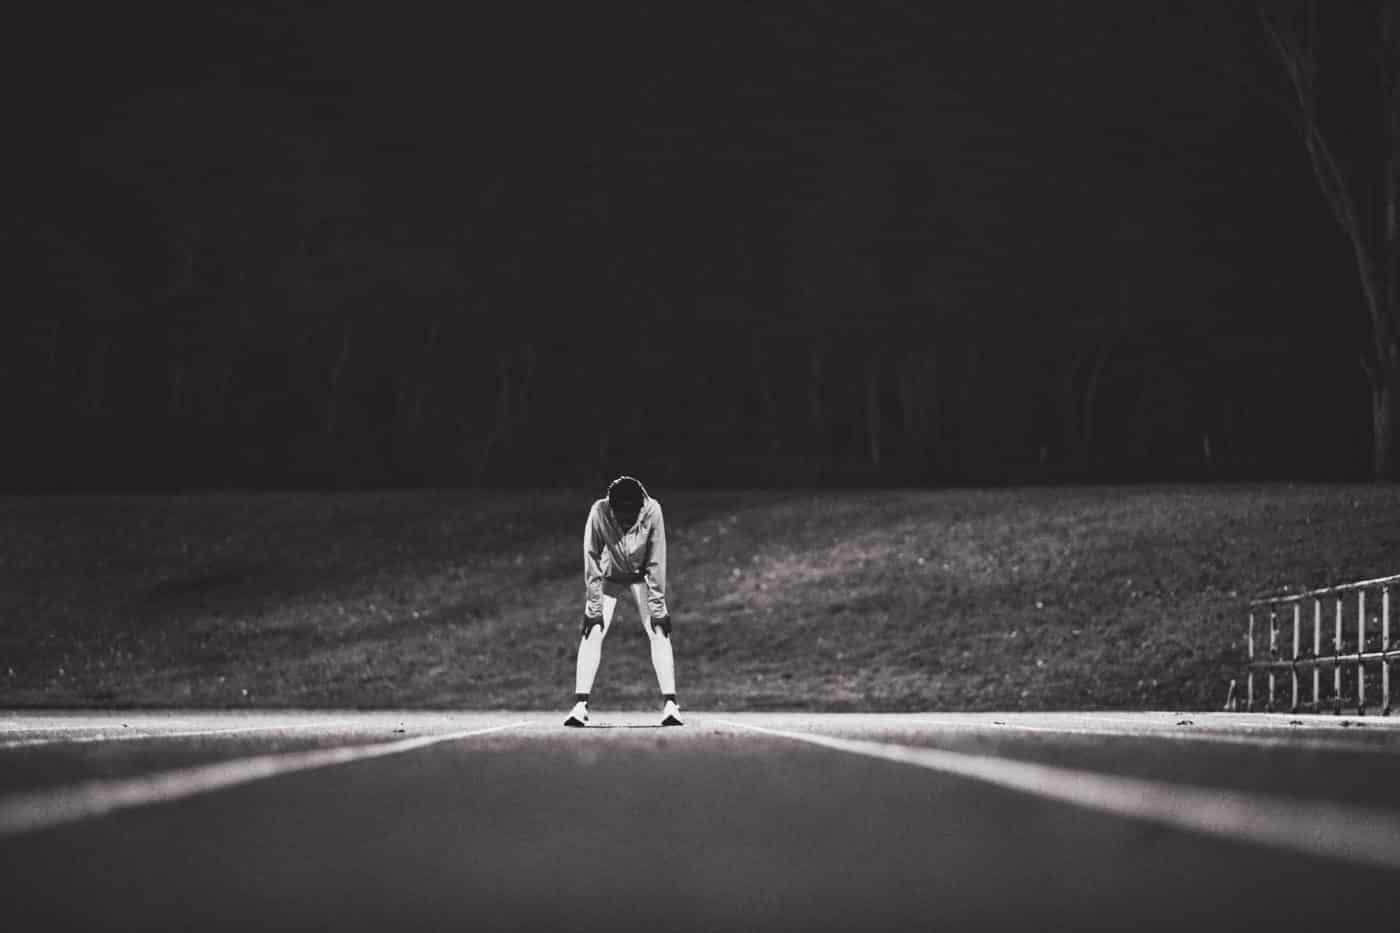 Dina-Asher-Smith-Nike-React-Infinity-Run-Runpack-Tokyo-15